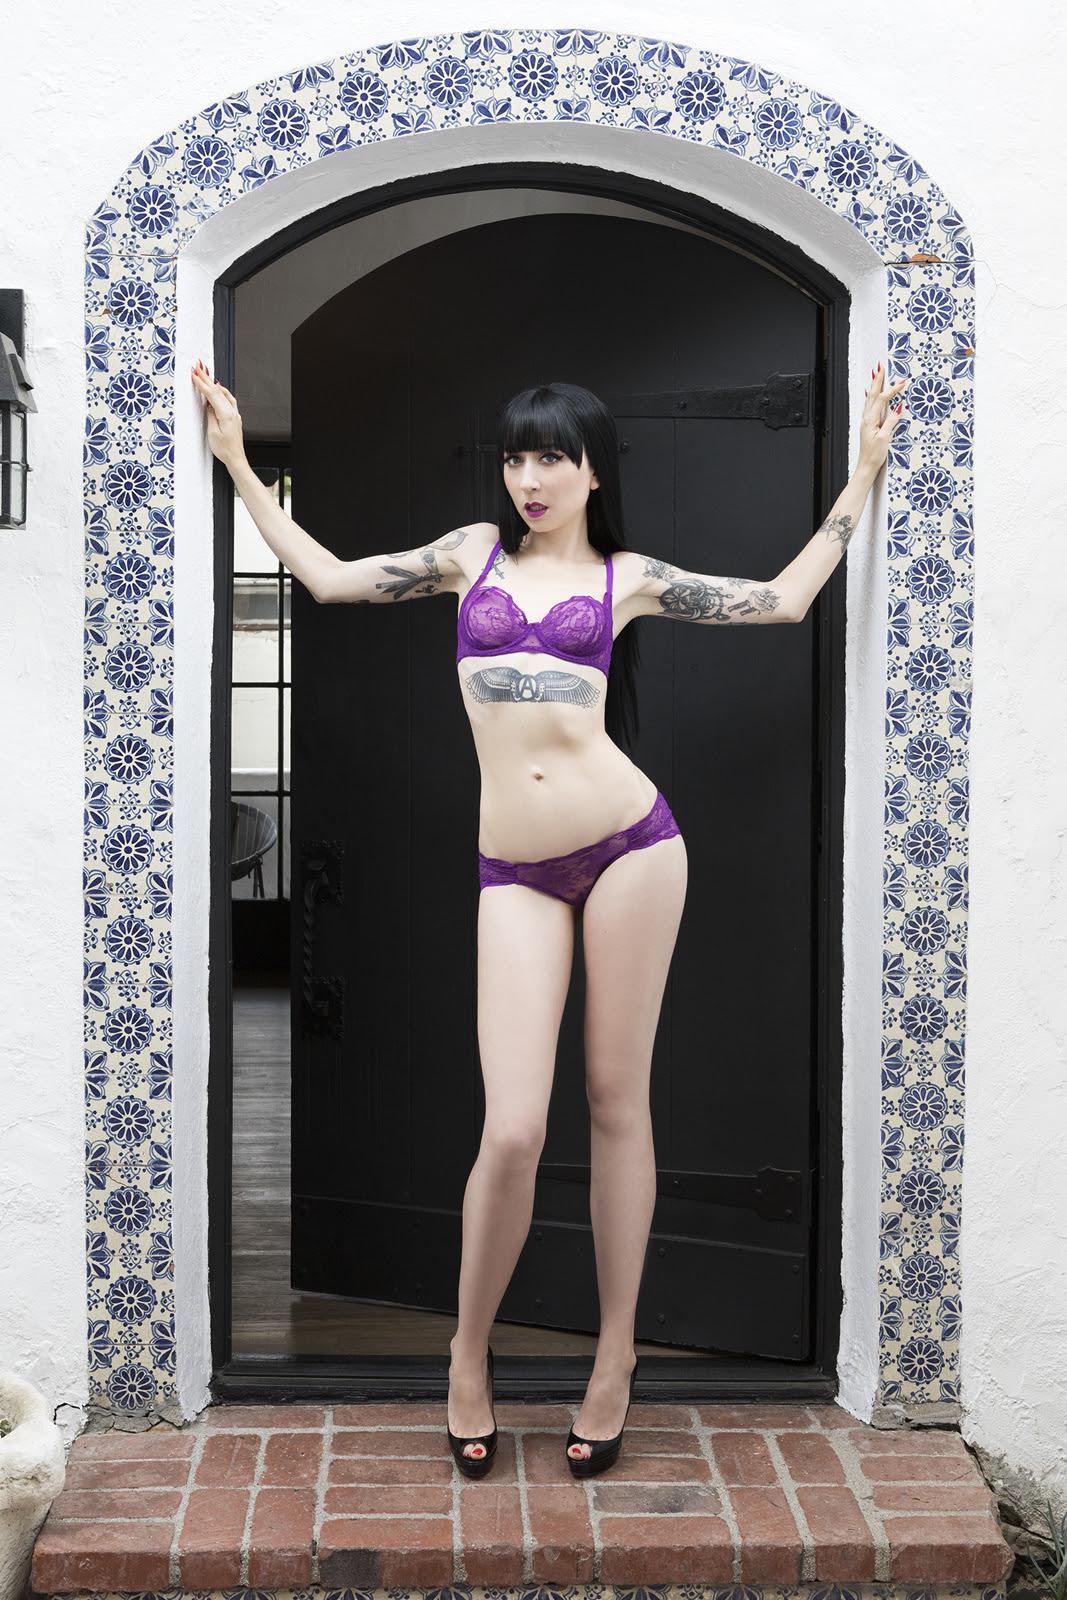 mistress_ramona_ryder_looking_good_sf_nyc_escort_purple_1.jpg